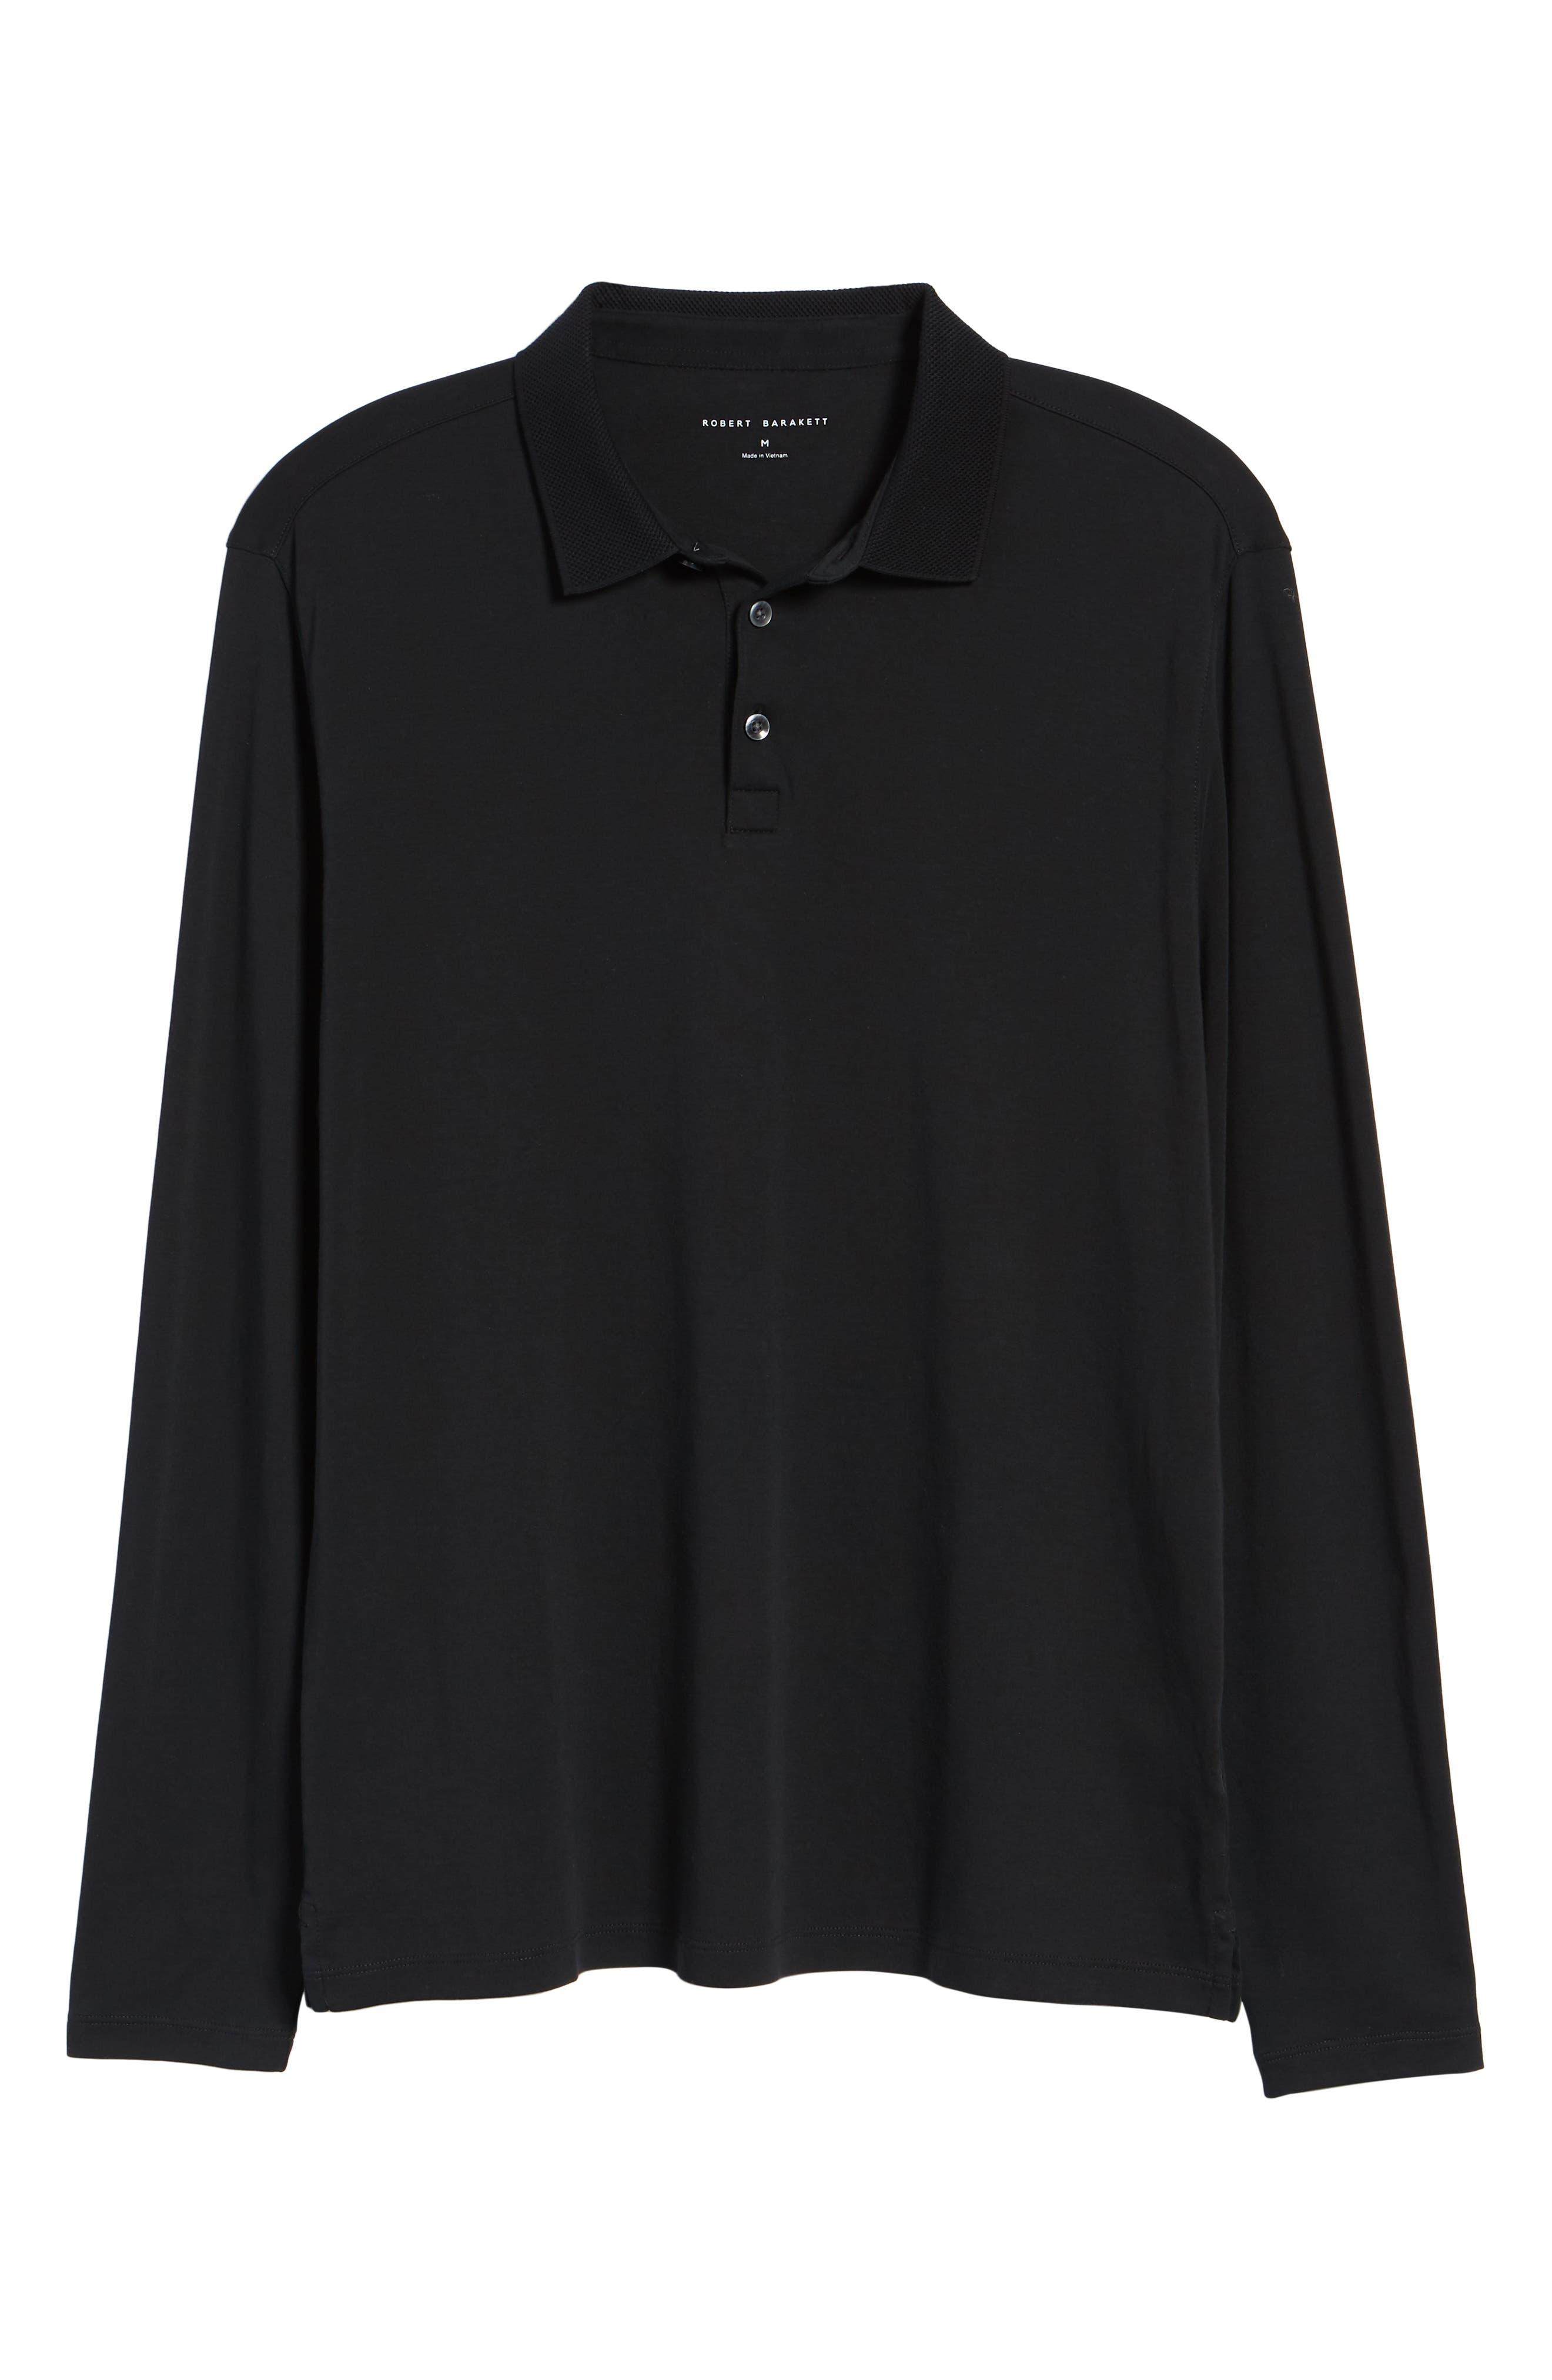 ROBERT BARAKETT, Batiste Long Sleeve Polo, Alternate thumbnail 6, color, BLACK